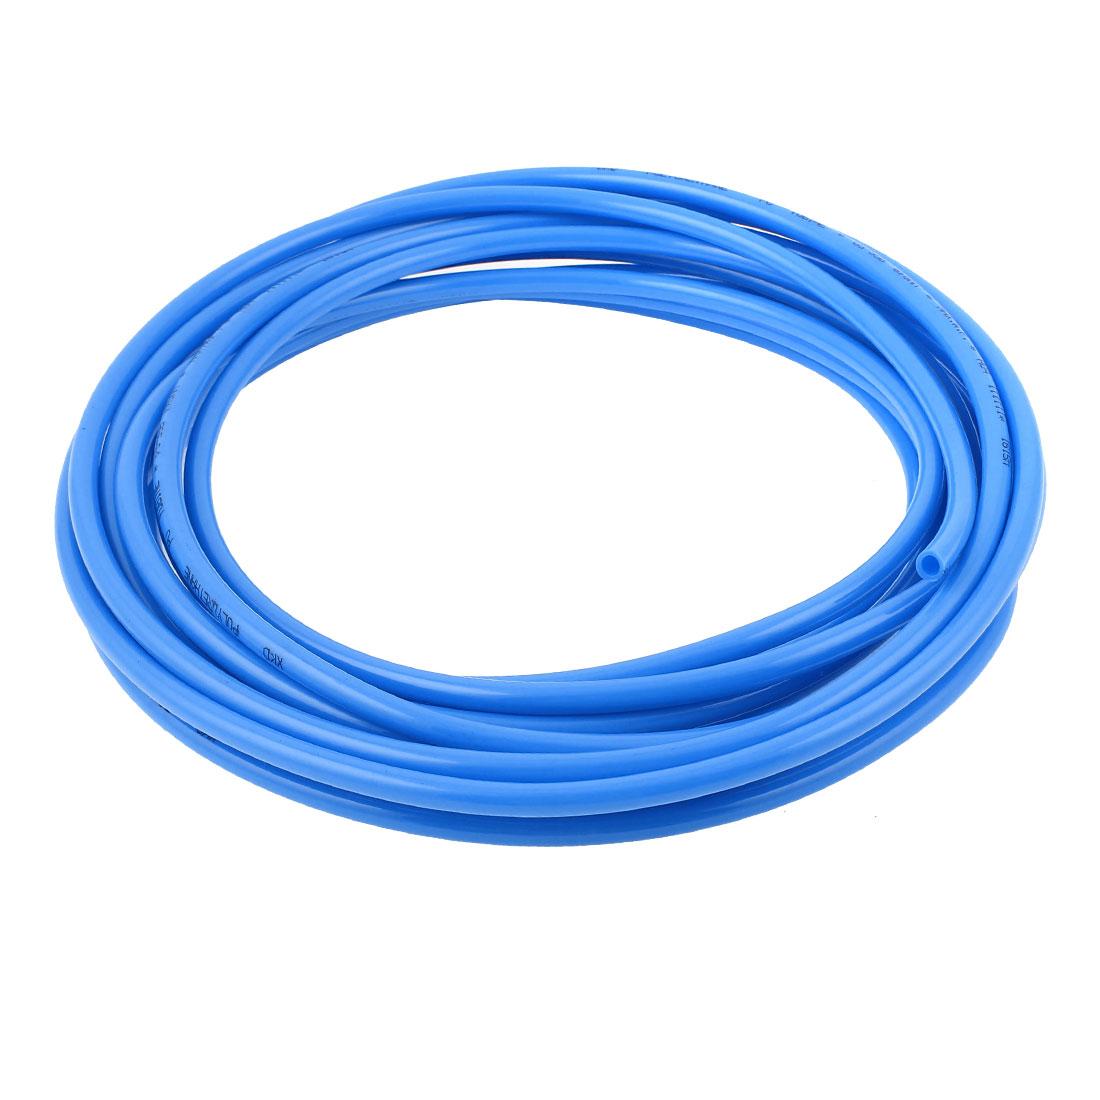 PU Polyurethane Flexible Air Tubing Pneumatic Pipe Tube Hose 8mm x 5mm 9M